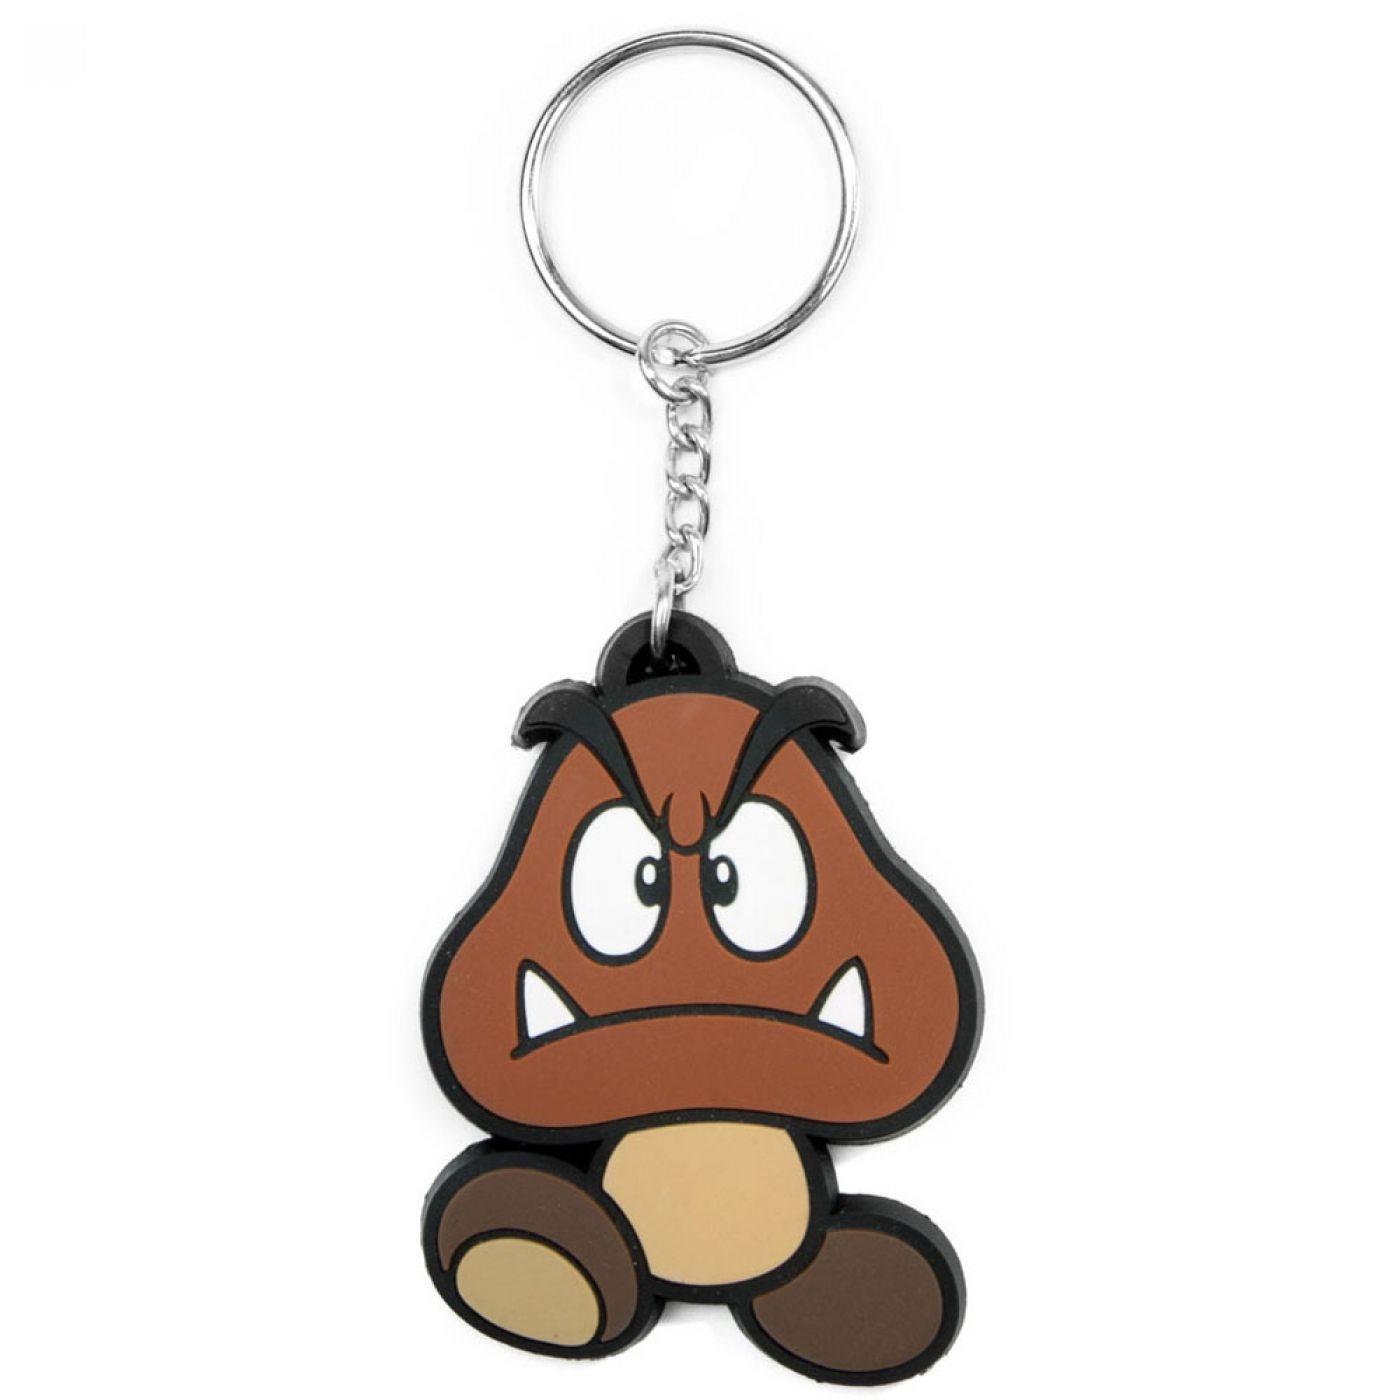 Nintendo Super Mario Bros Goomba keychain